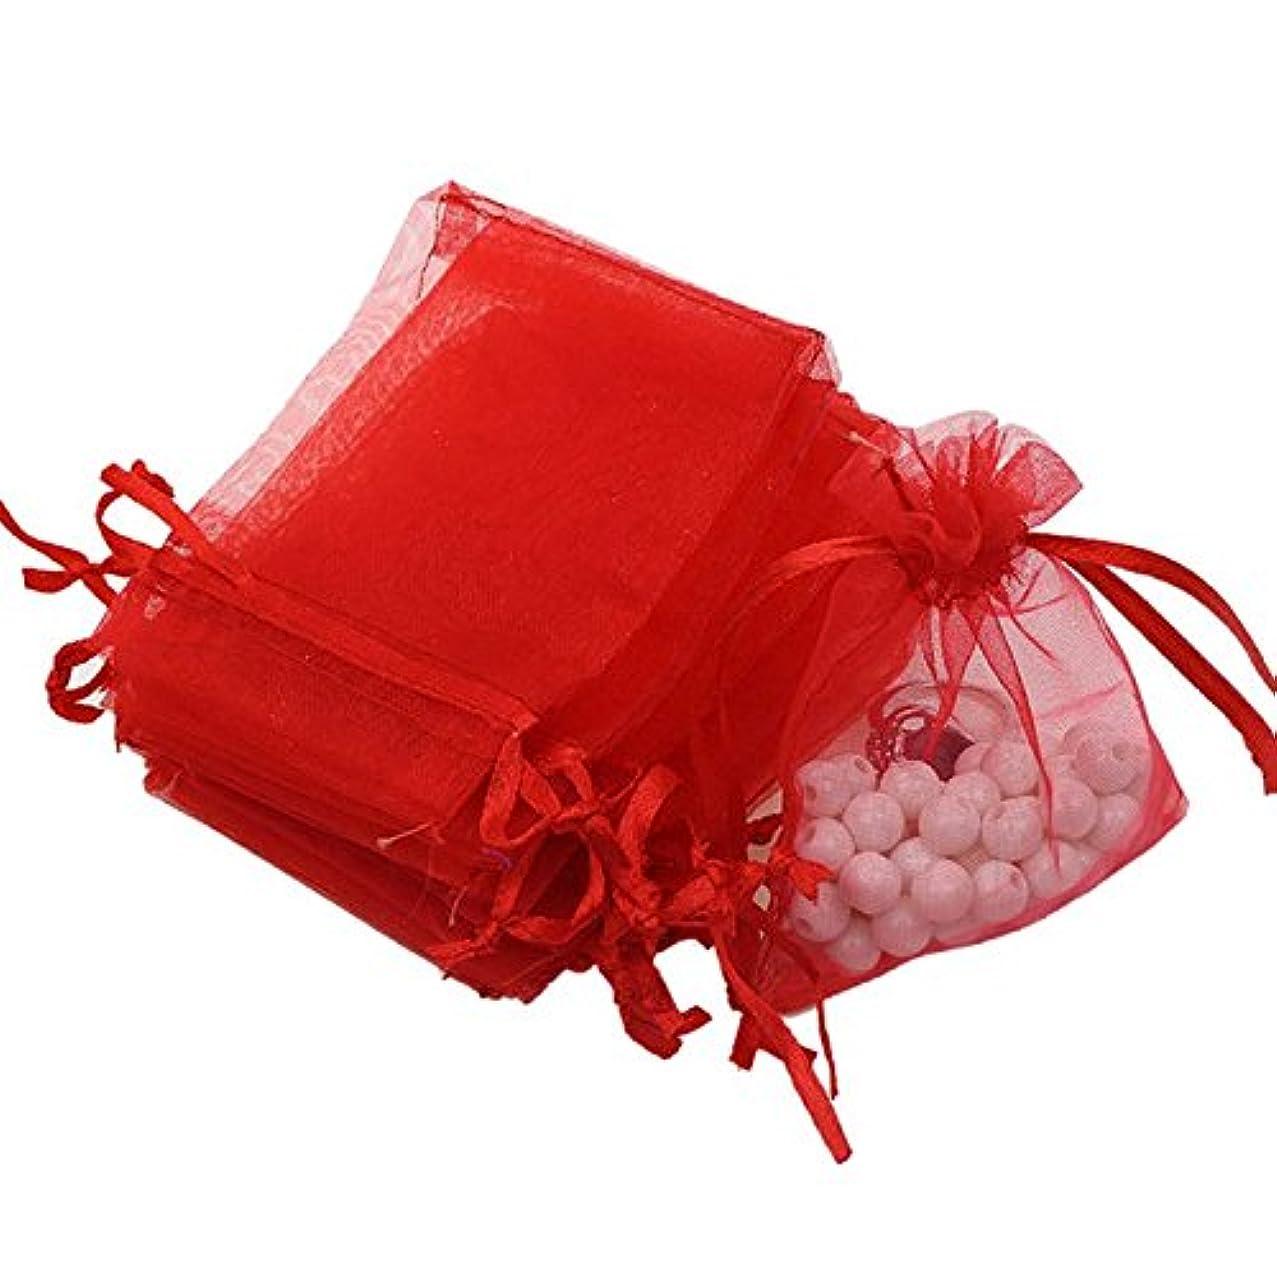 100pcs Drawstrings Organza Gift Candy Bags 4'' x6